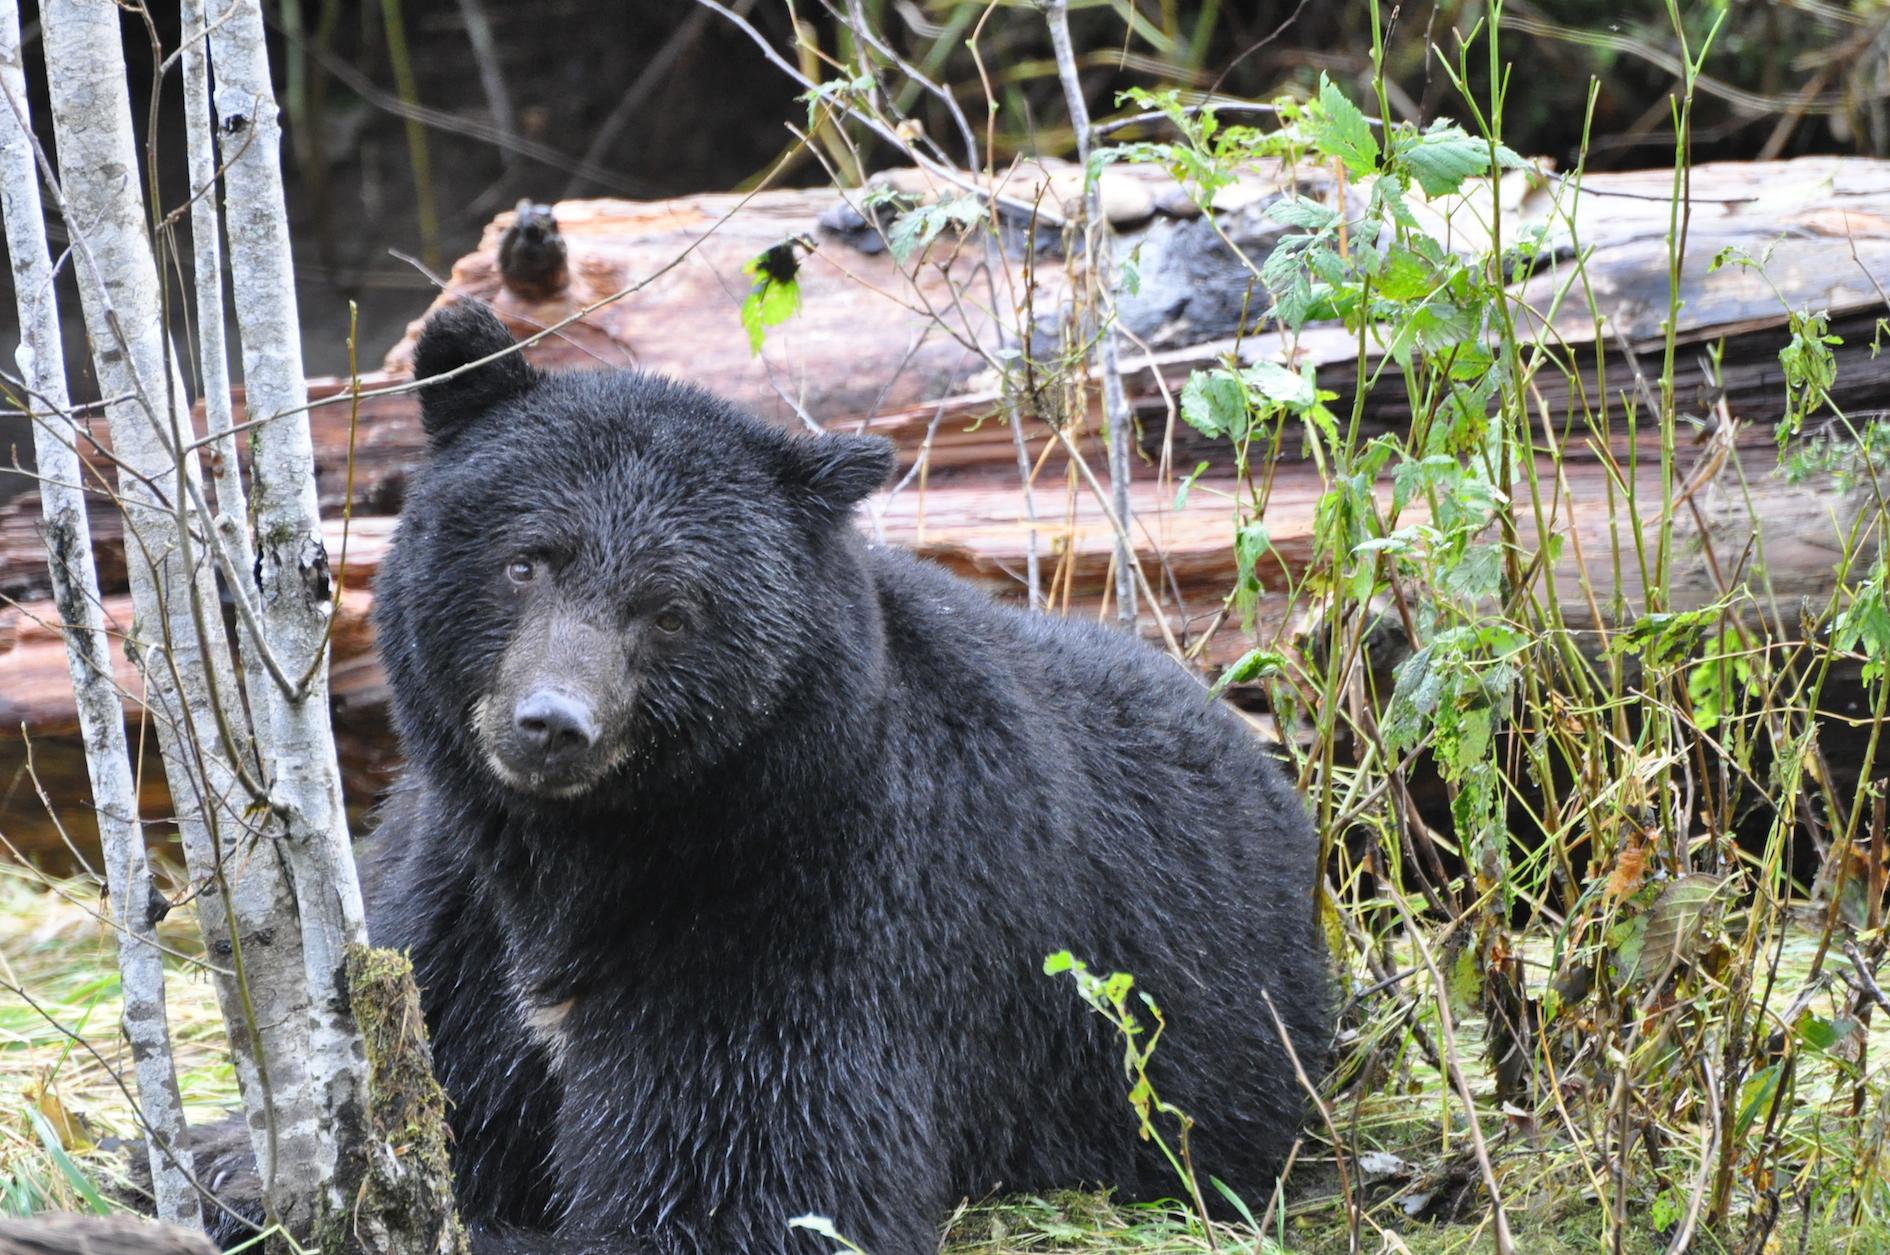 Roadside bear kills raise monitoring concerns